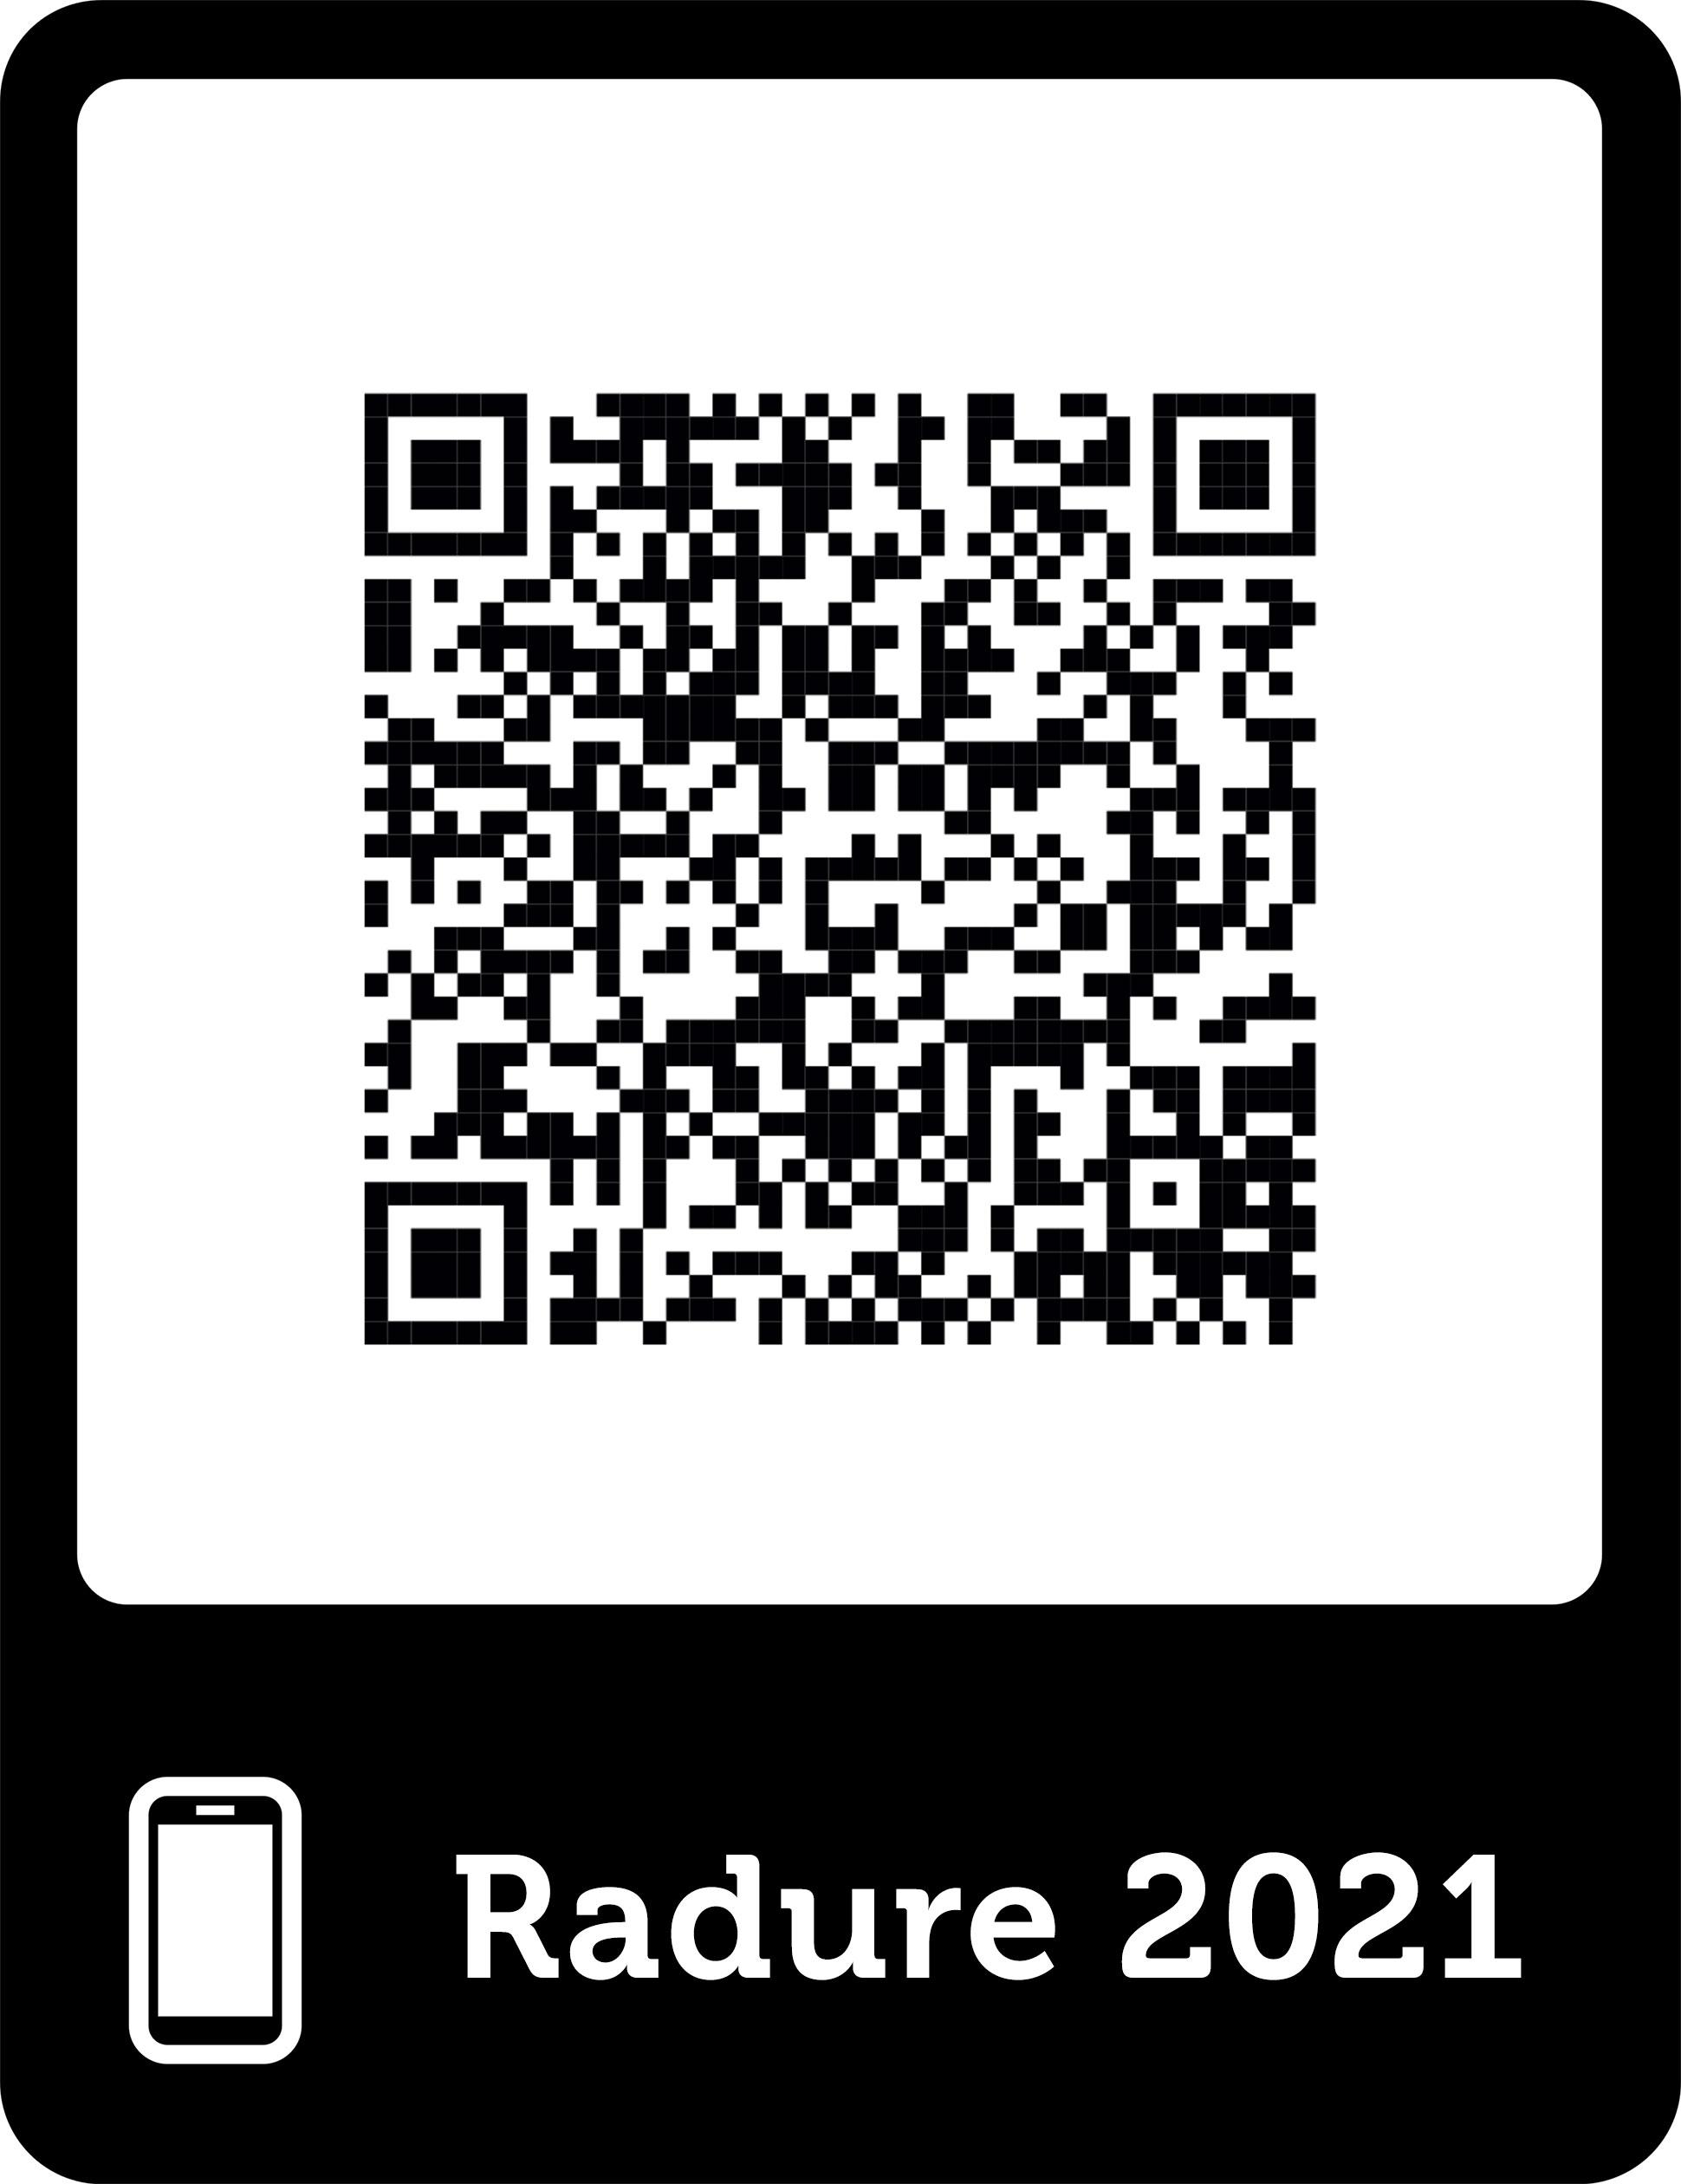 qr-code-radure-2021-frame